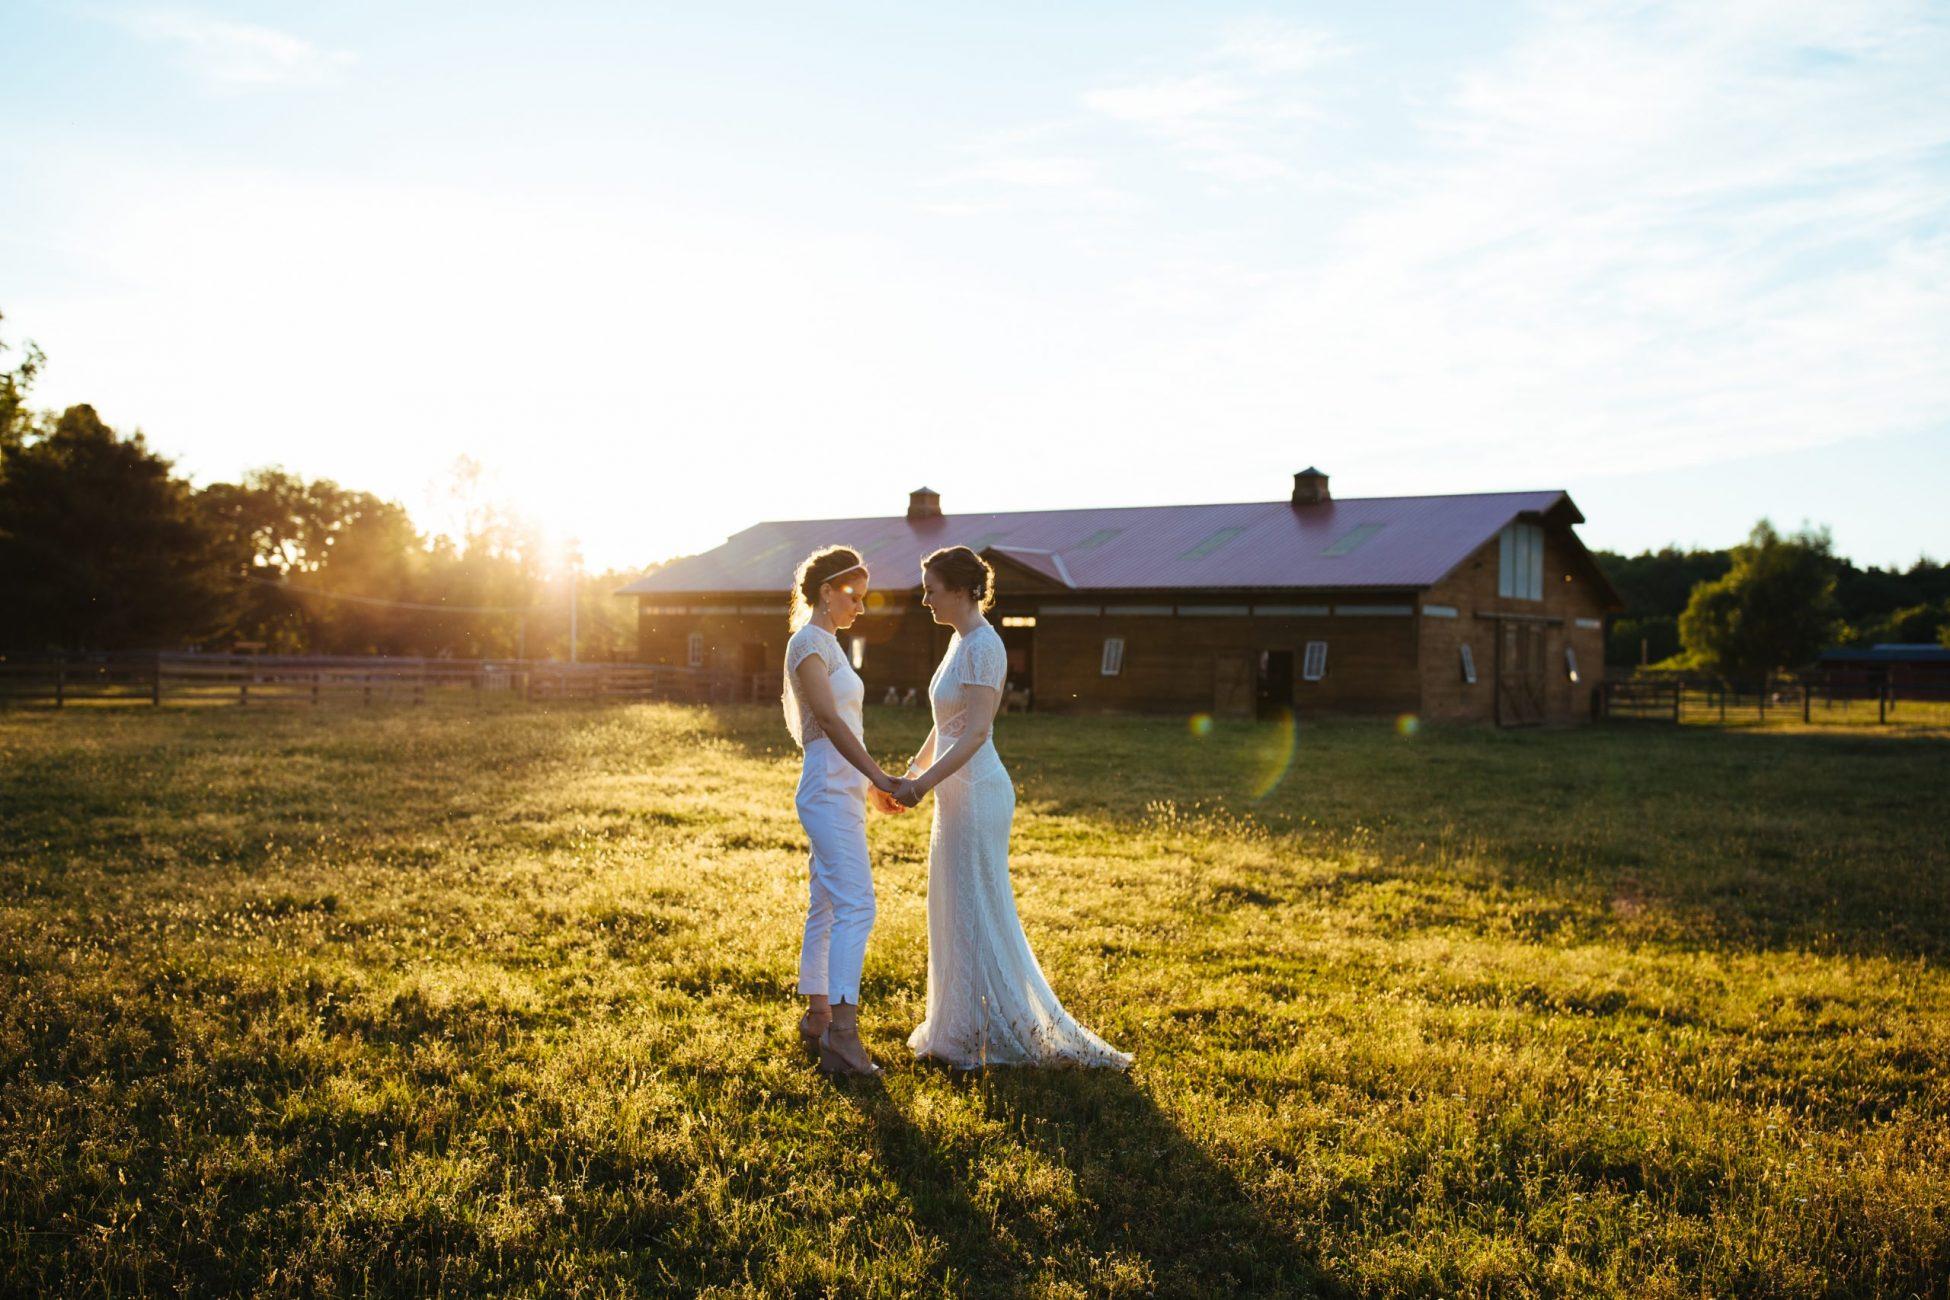 gay vegan wedding at the woodstock farm sanctuary in high falls, new york